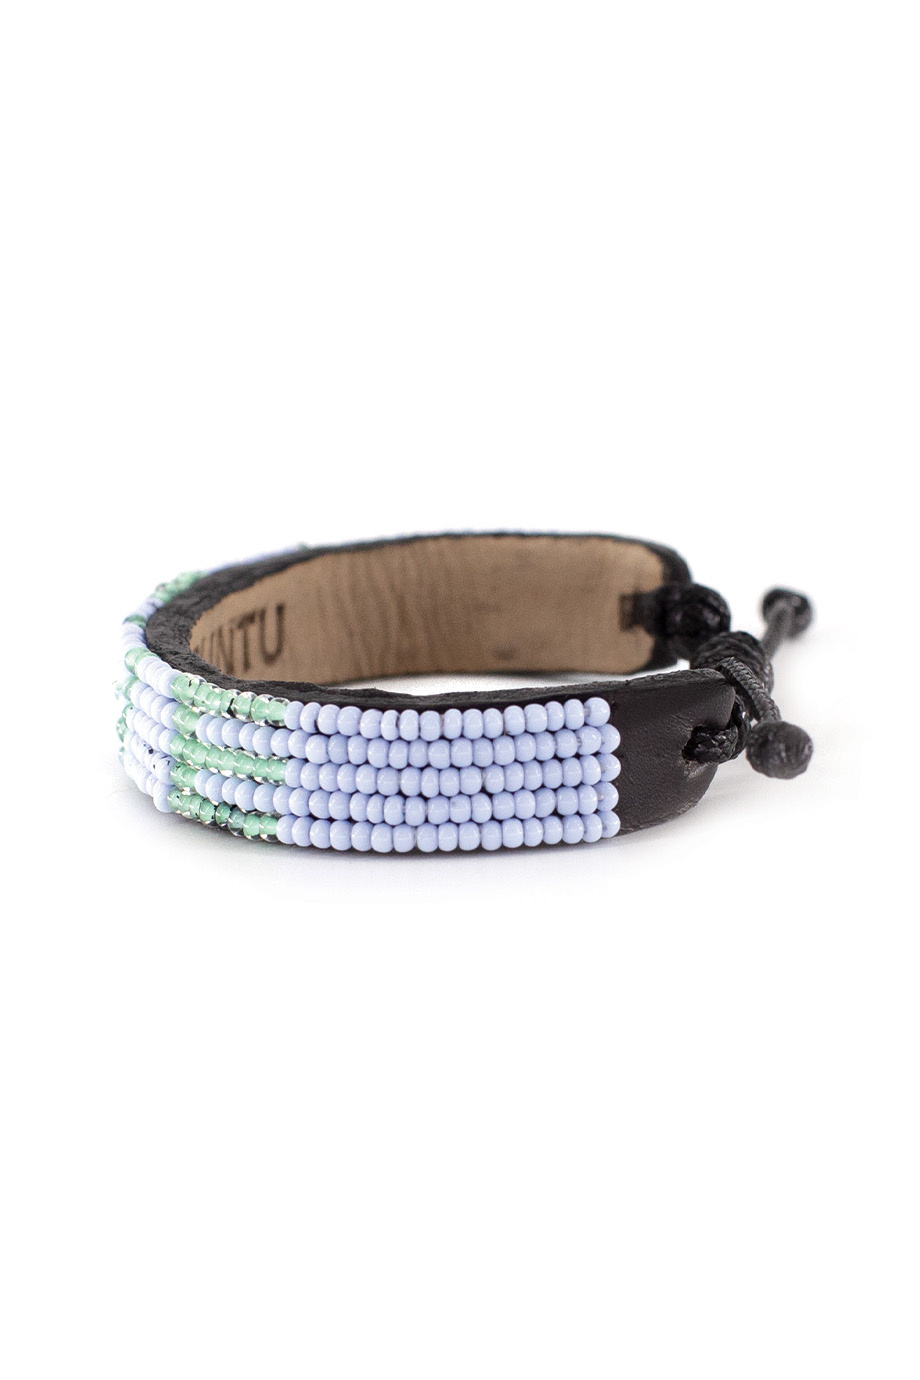 5 row LOVE Bracelet PaleBlue/Turquoise-2